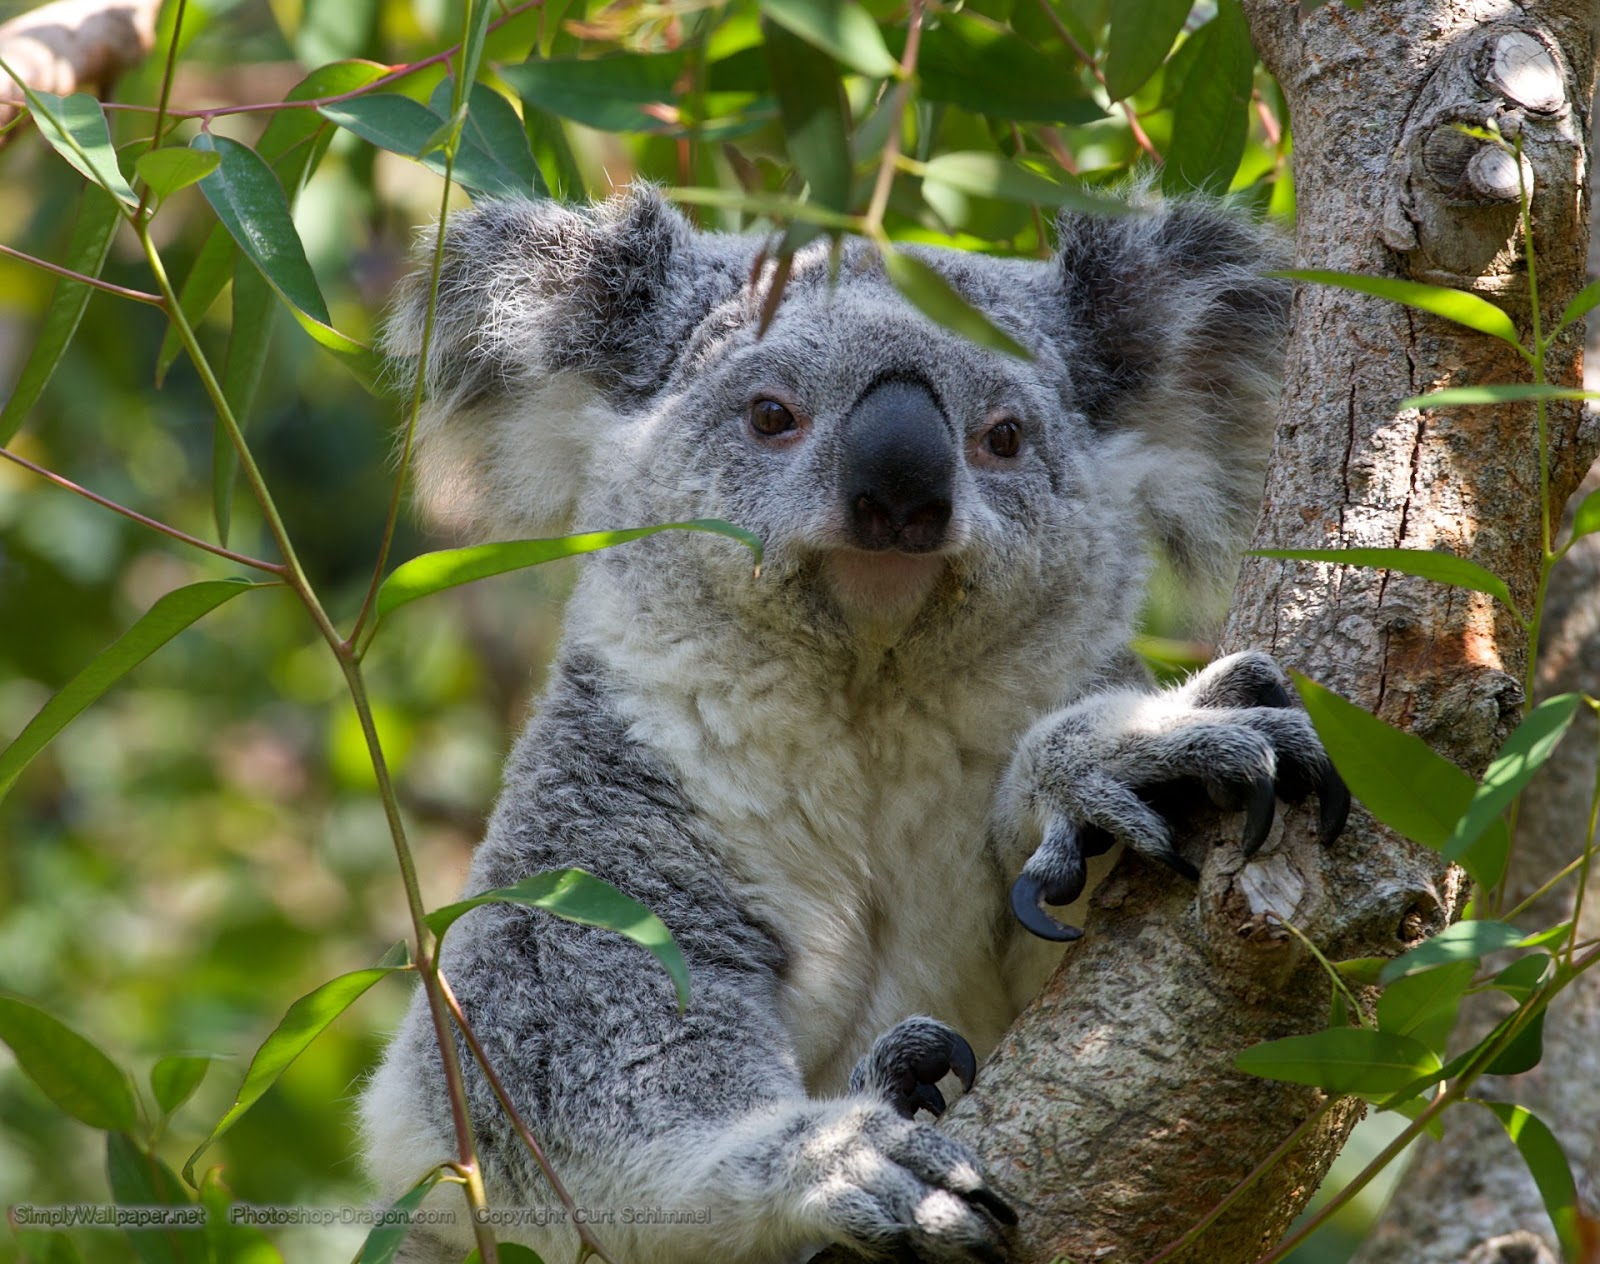 Cute Wombat Wallpapers Hd Wallpapers Desktop Wombat Hd Wallpapers